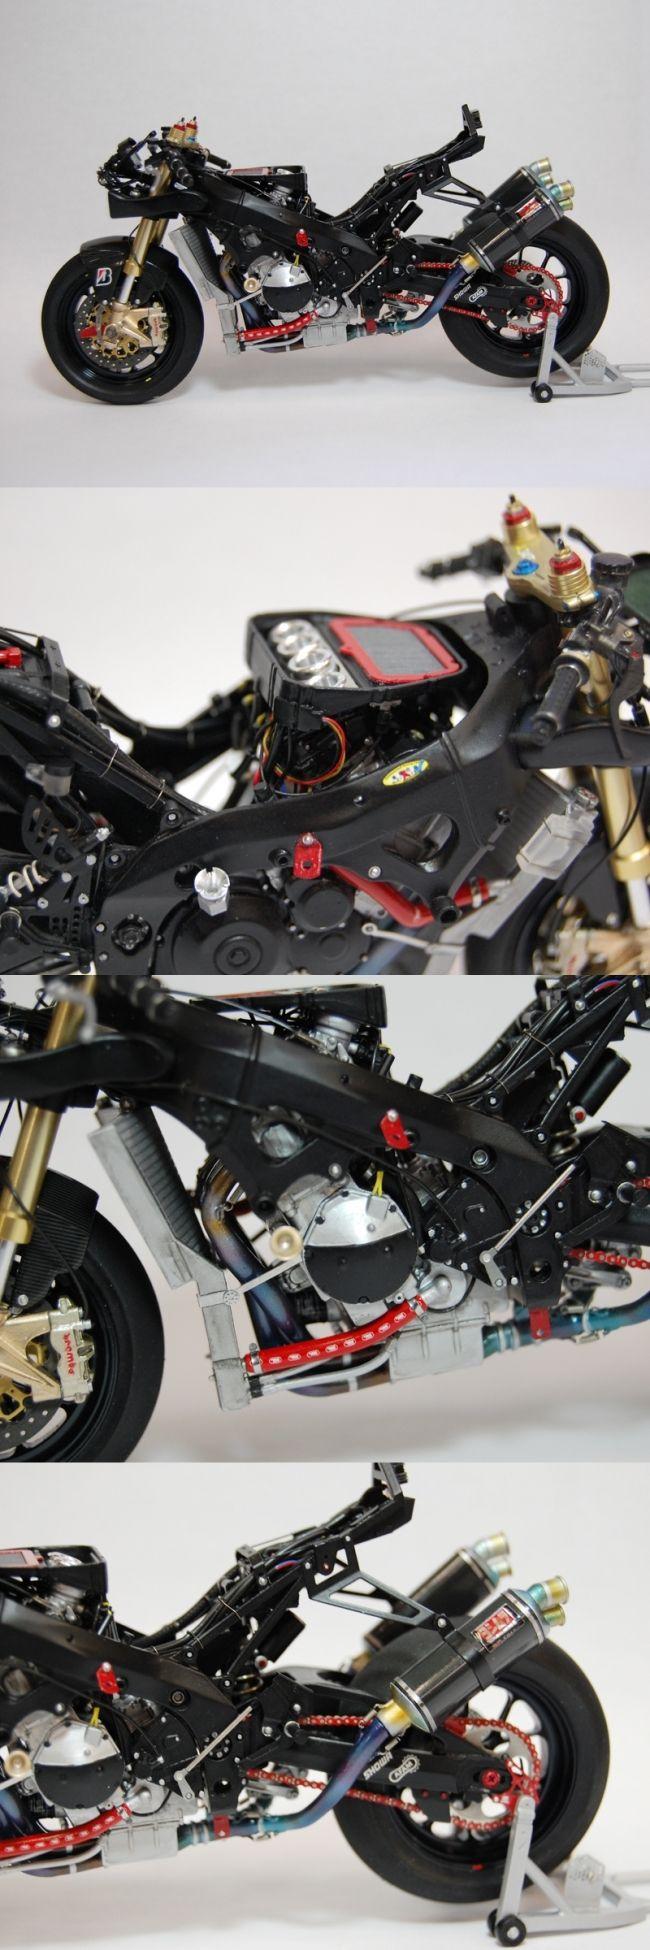 【YOSHIMURA】Yoshimura Suzuki鈴鹿9小時耐力賽 1/12全細部套件 - 「Webike-摩托百貨」